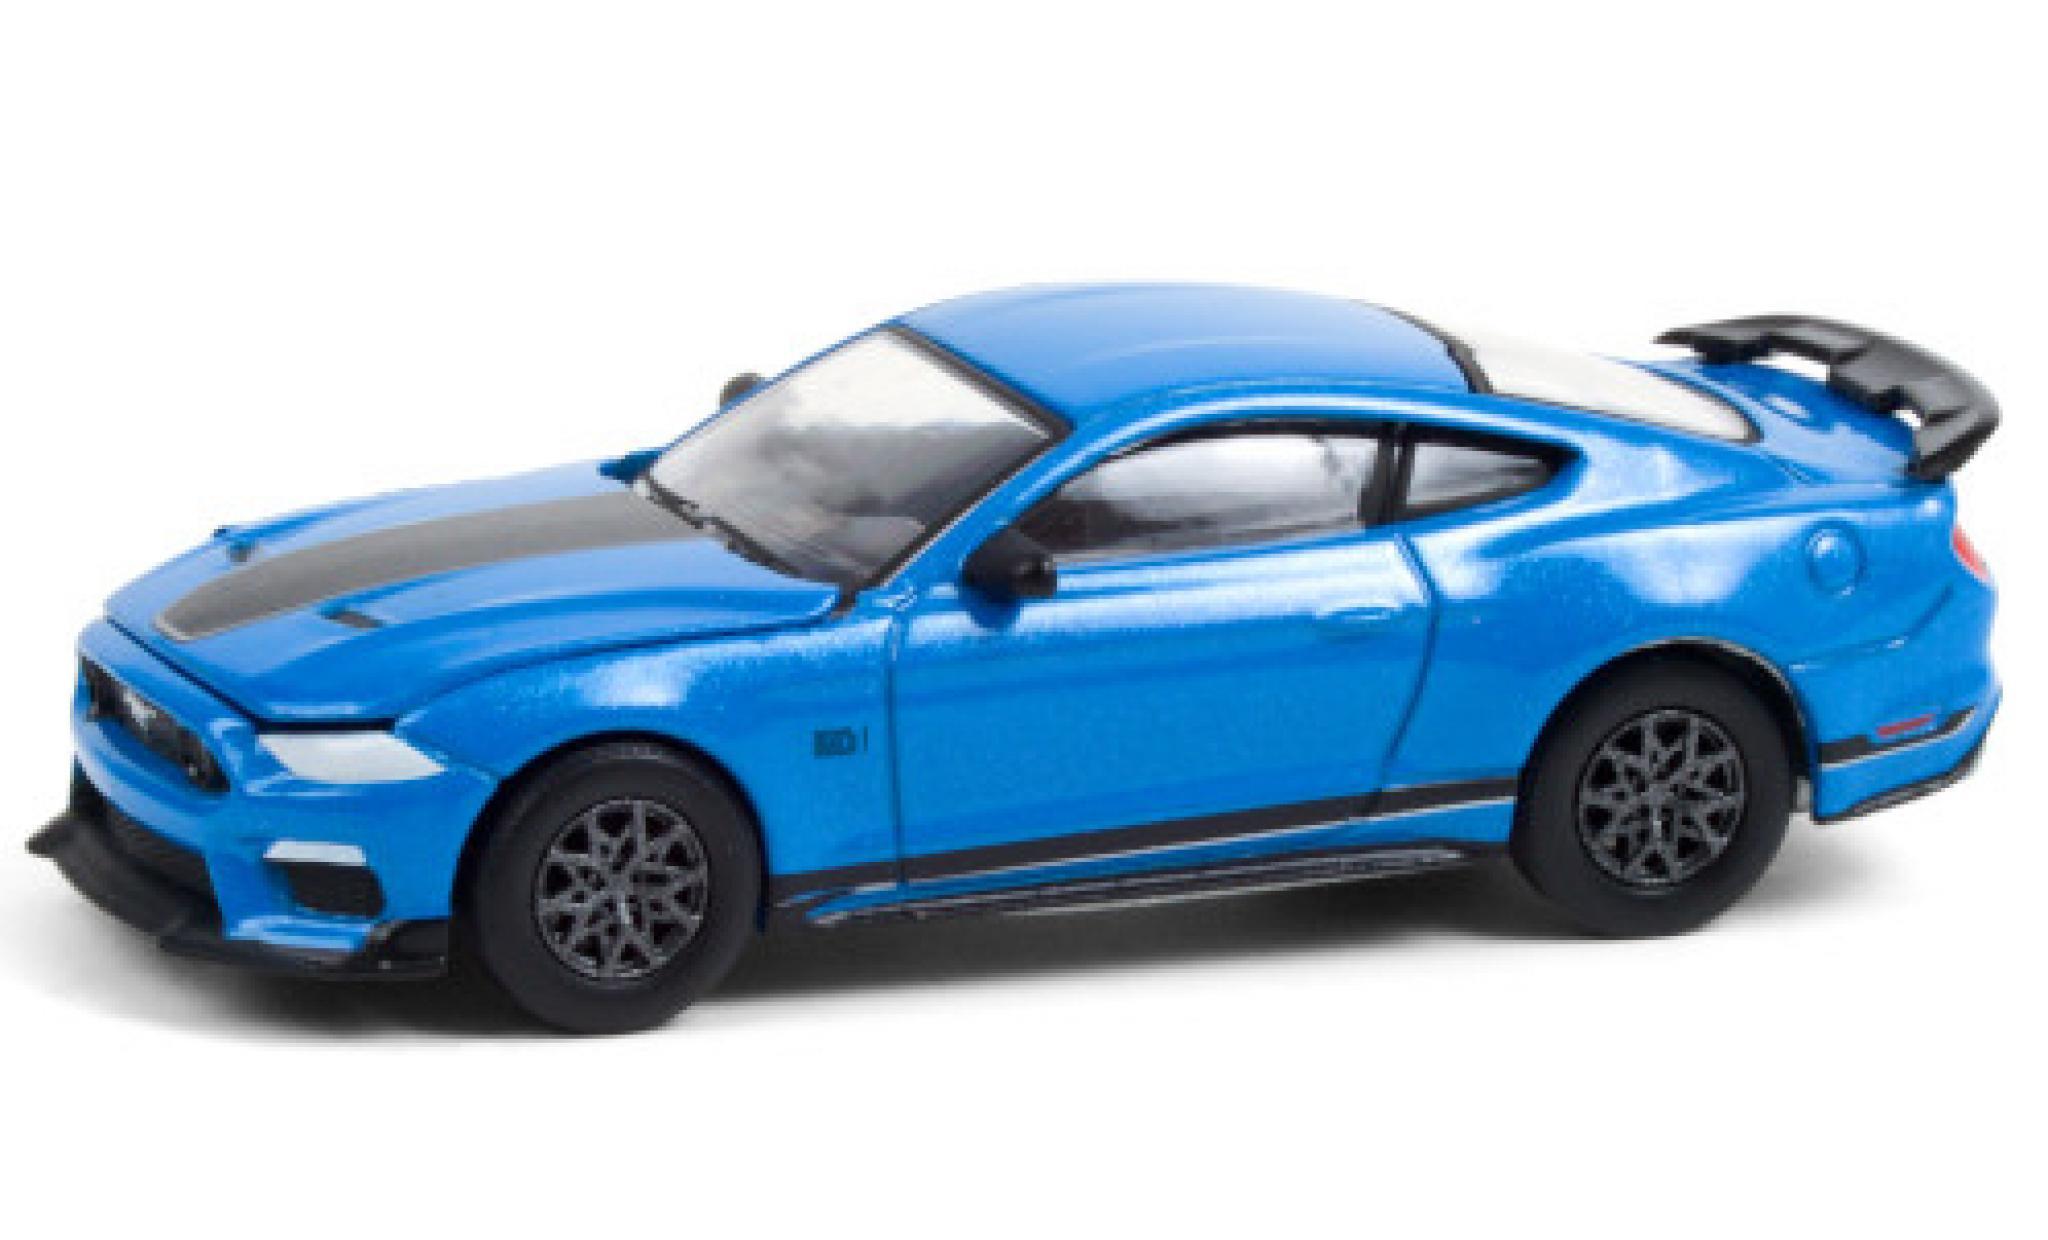 Ford Mustang 1/64 Greenlight Mach 1 metallise blue/matt-black 2021